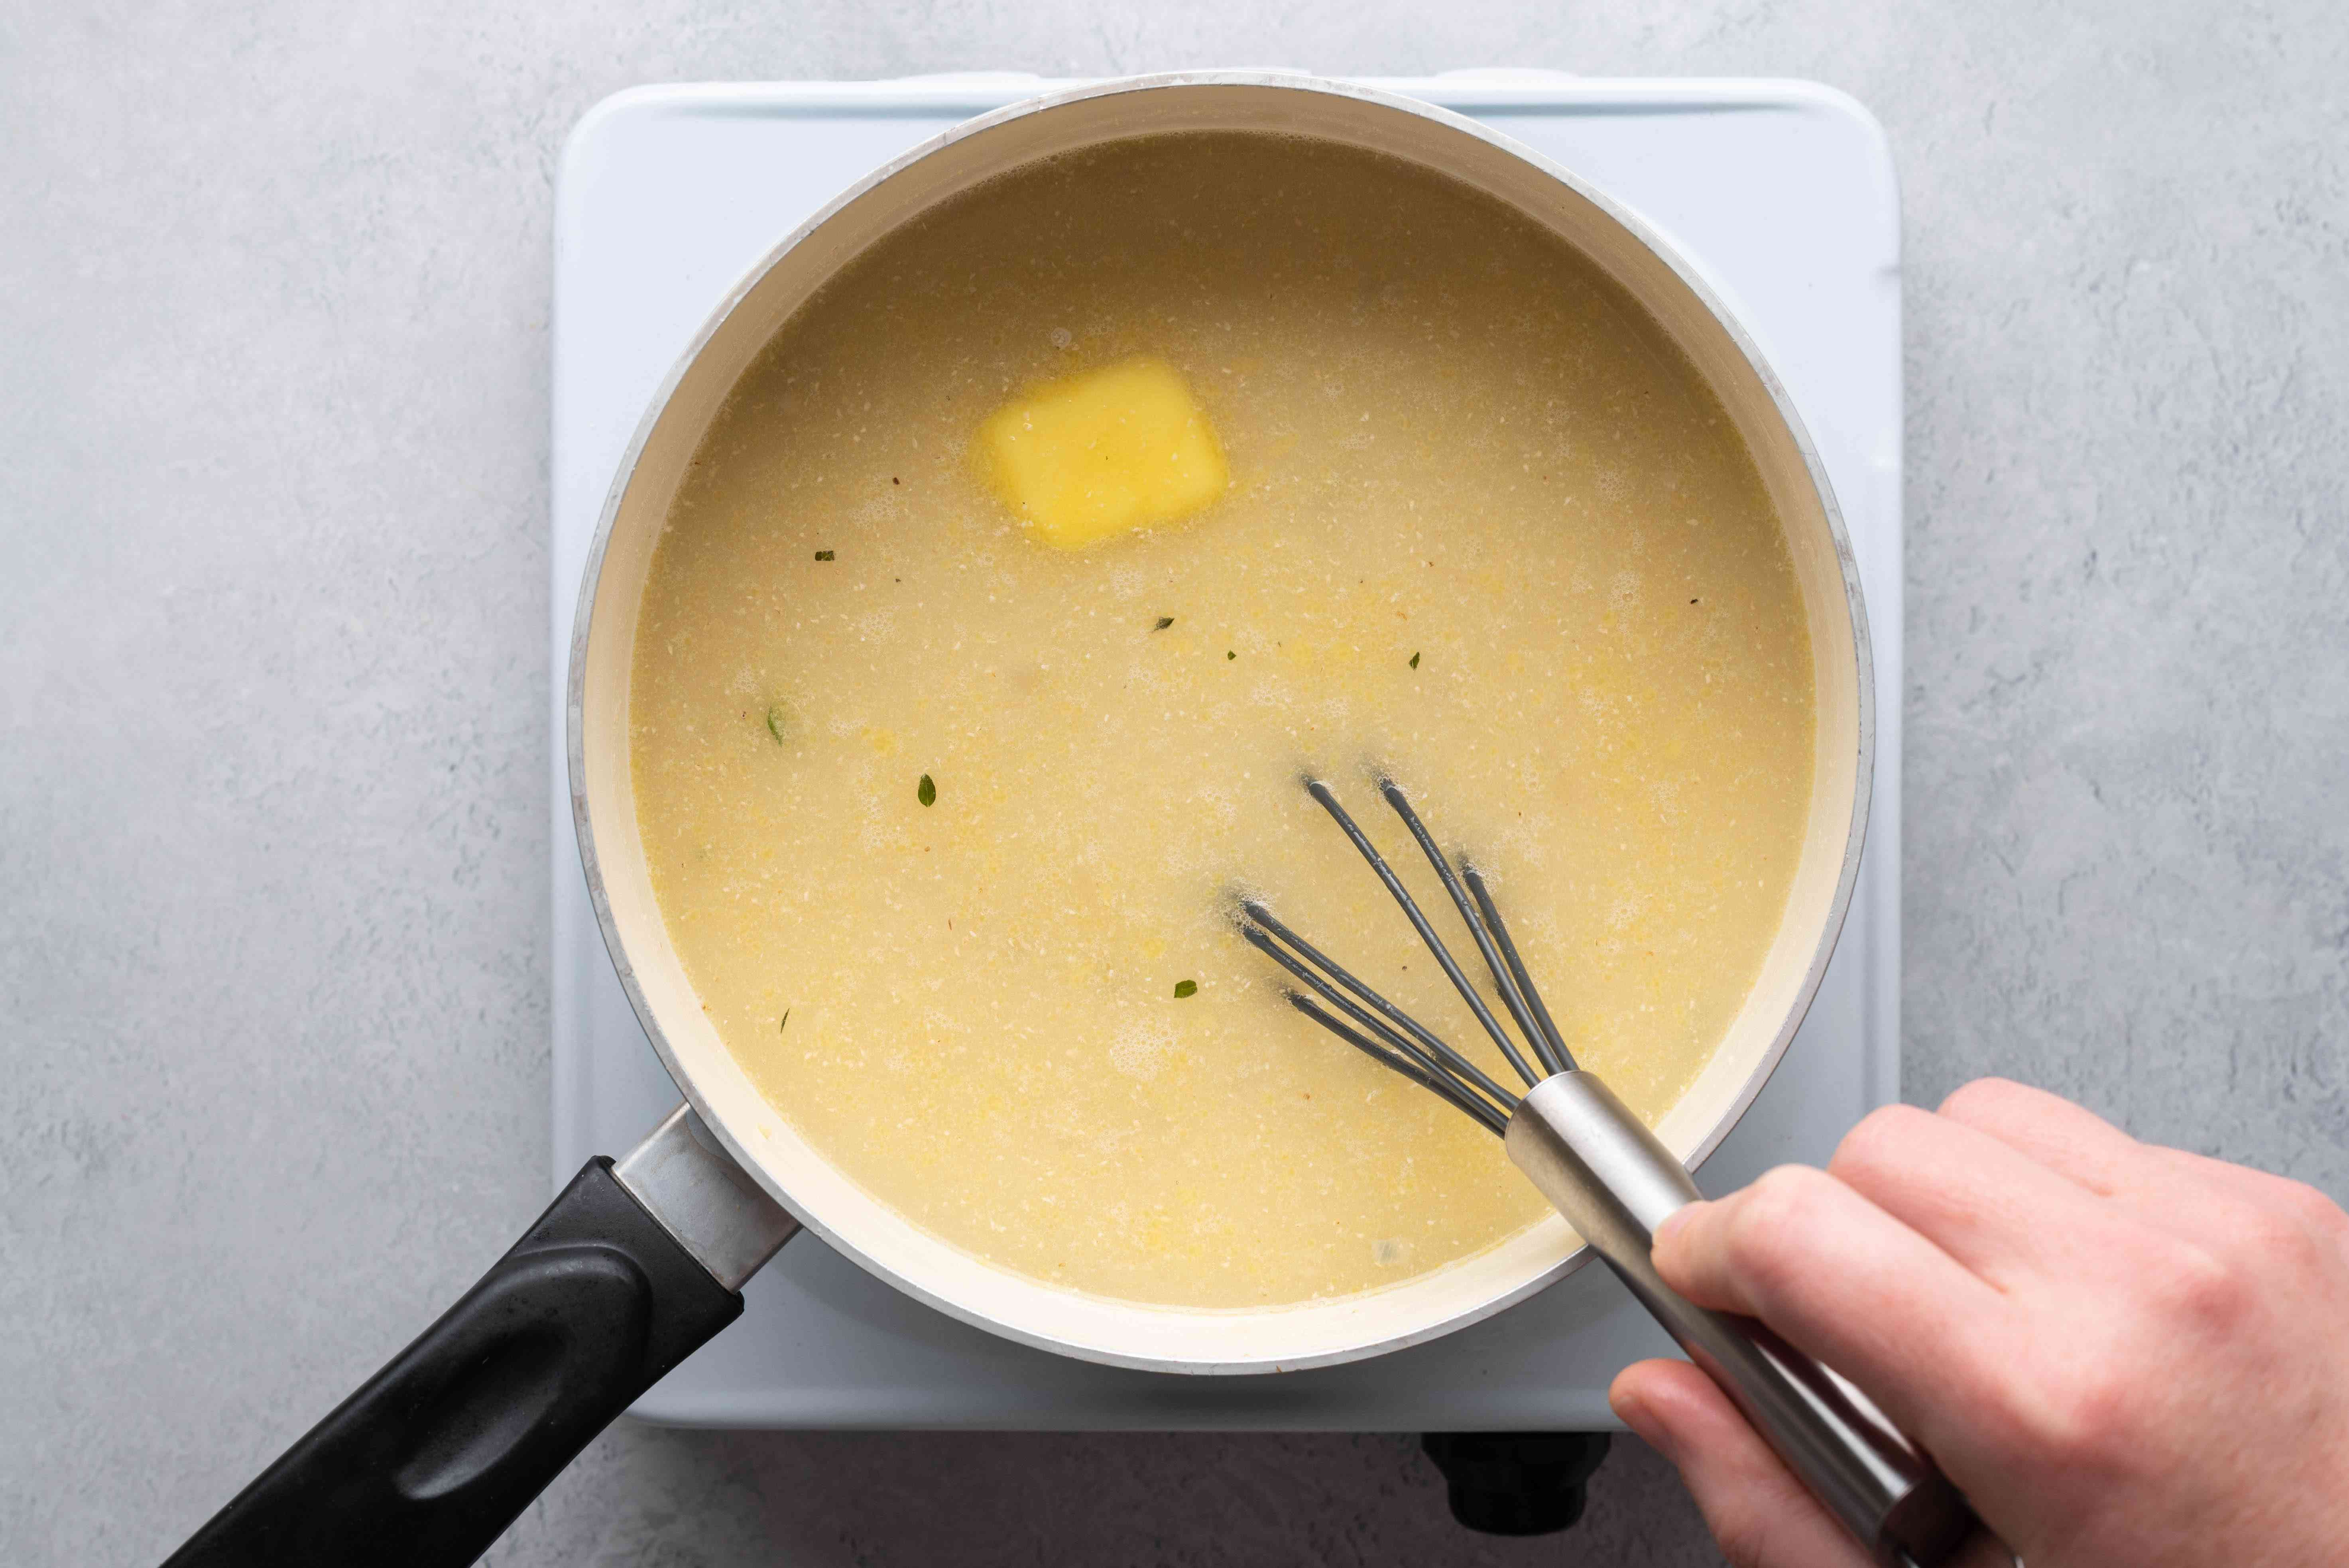 cornmeal, butter and okra liquid in a pot